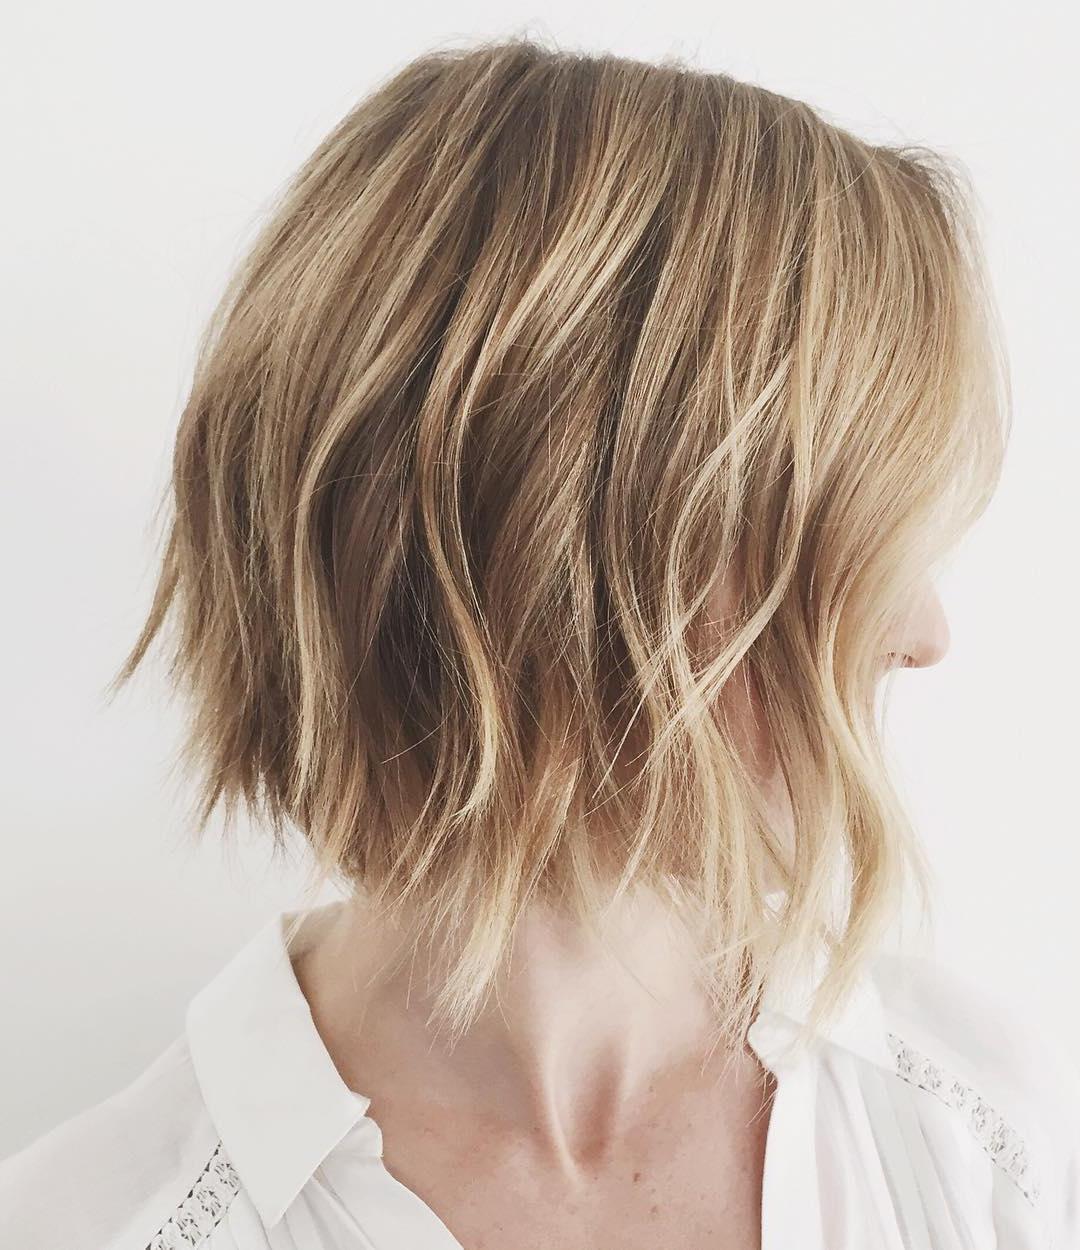 Top 19 Splendiferous Best Short Bob Hairstyles Inspiration Teens Within Teenage Girl Short Hairstyles (View 7 of 25)